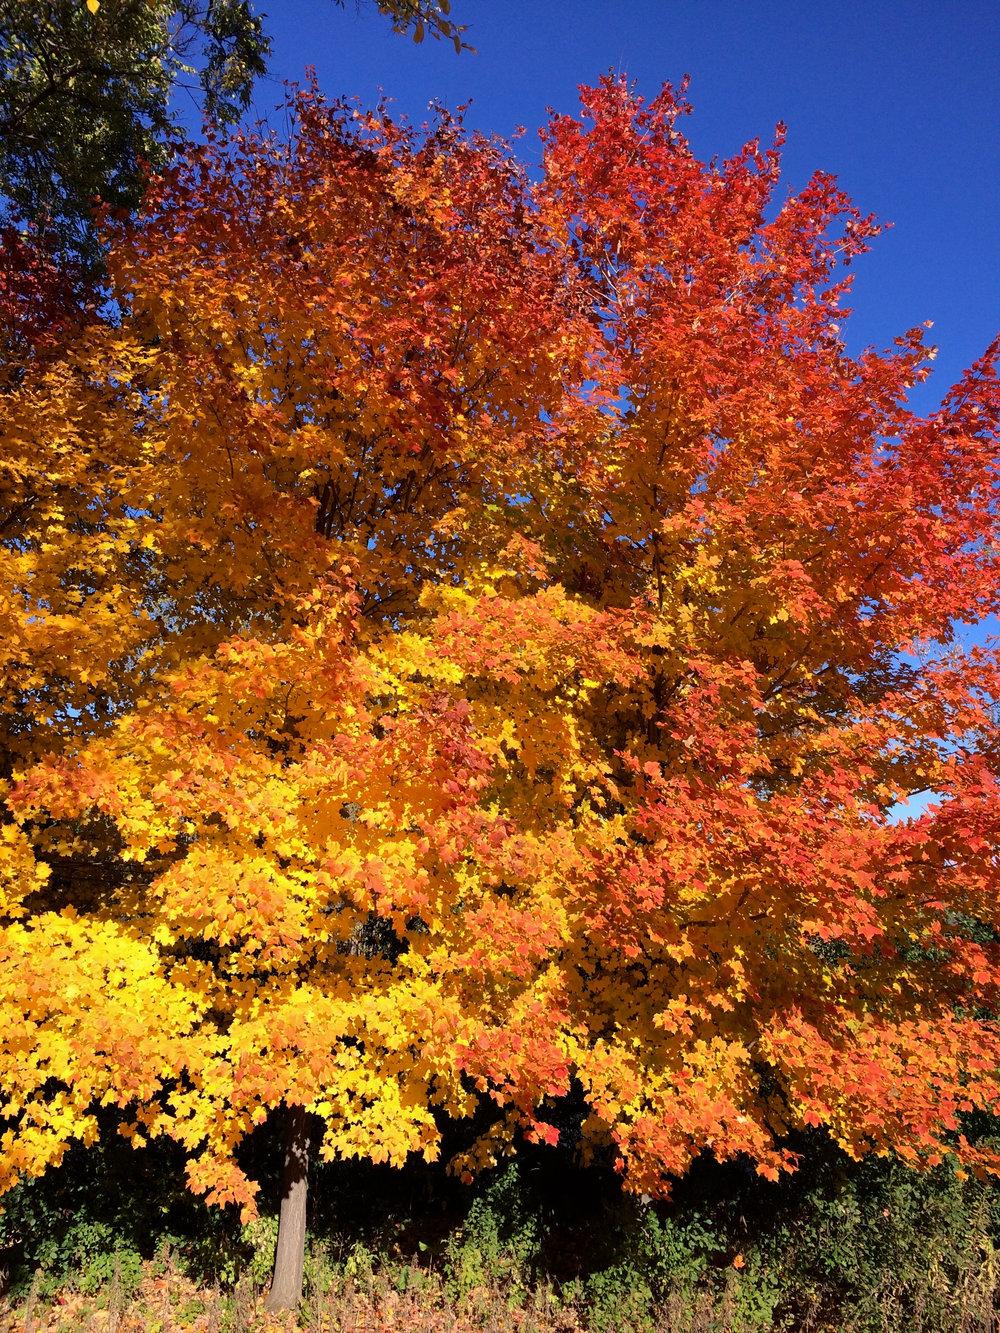 cindi_fall_trees_spiritedtable_photo1.jpg